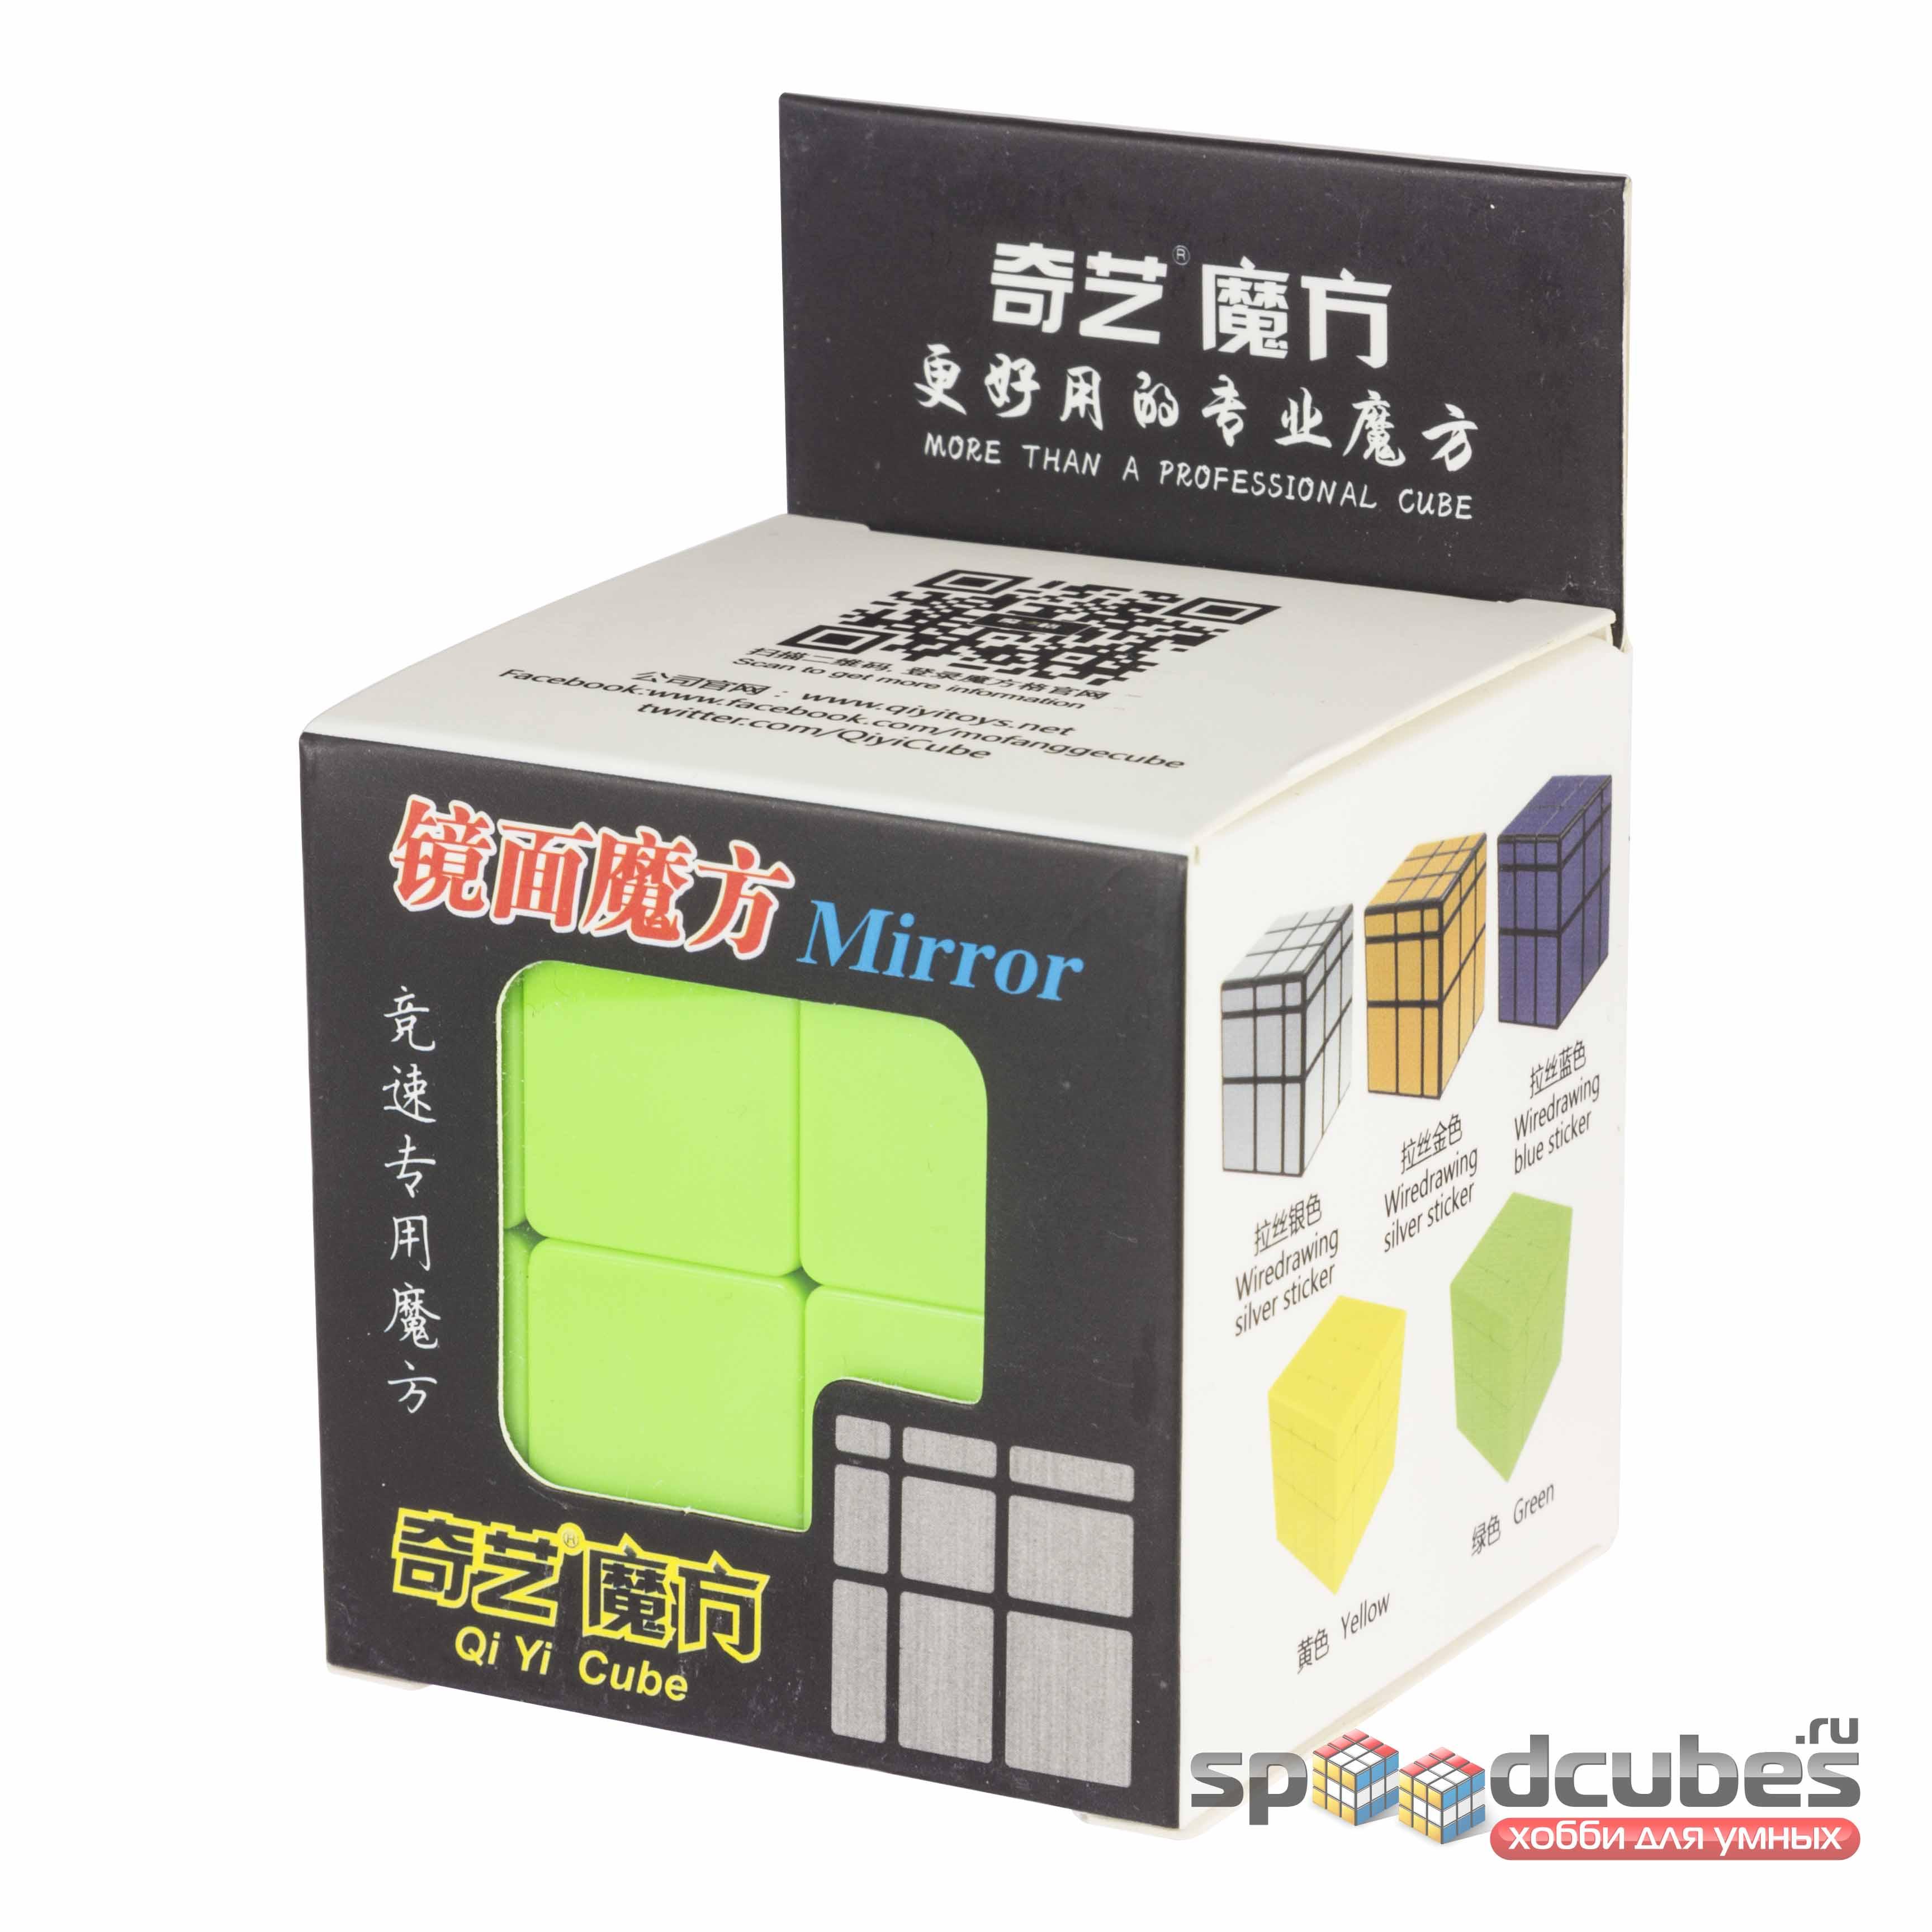 QiYi (MoFangGe) 3×3 Green Mirror Cube 1